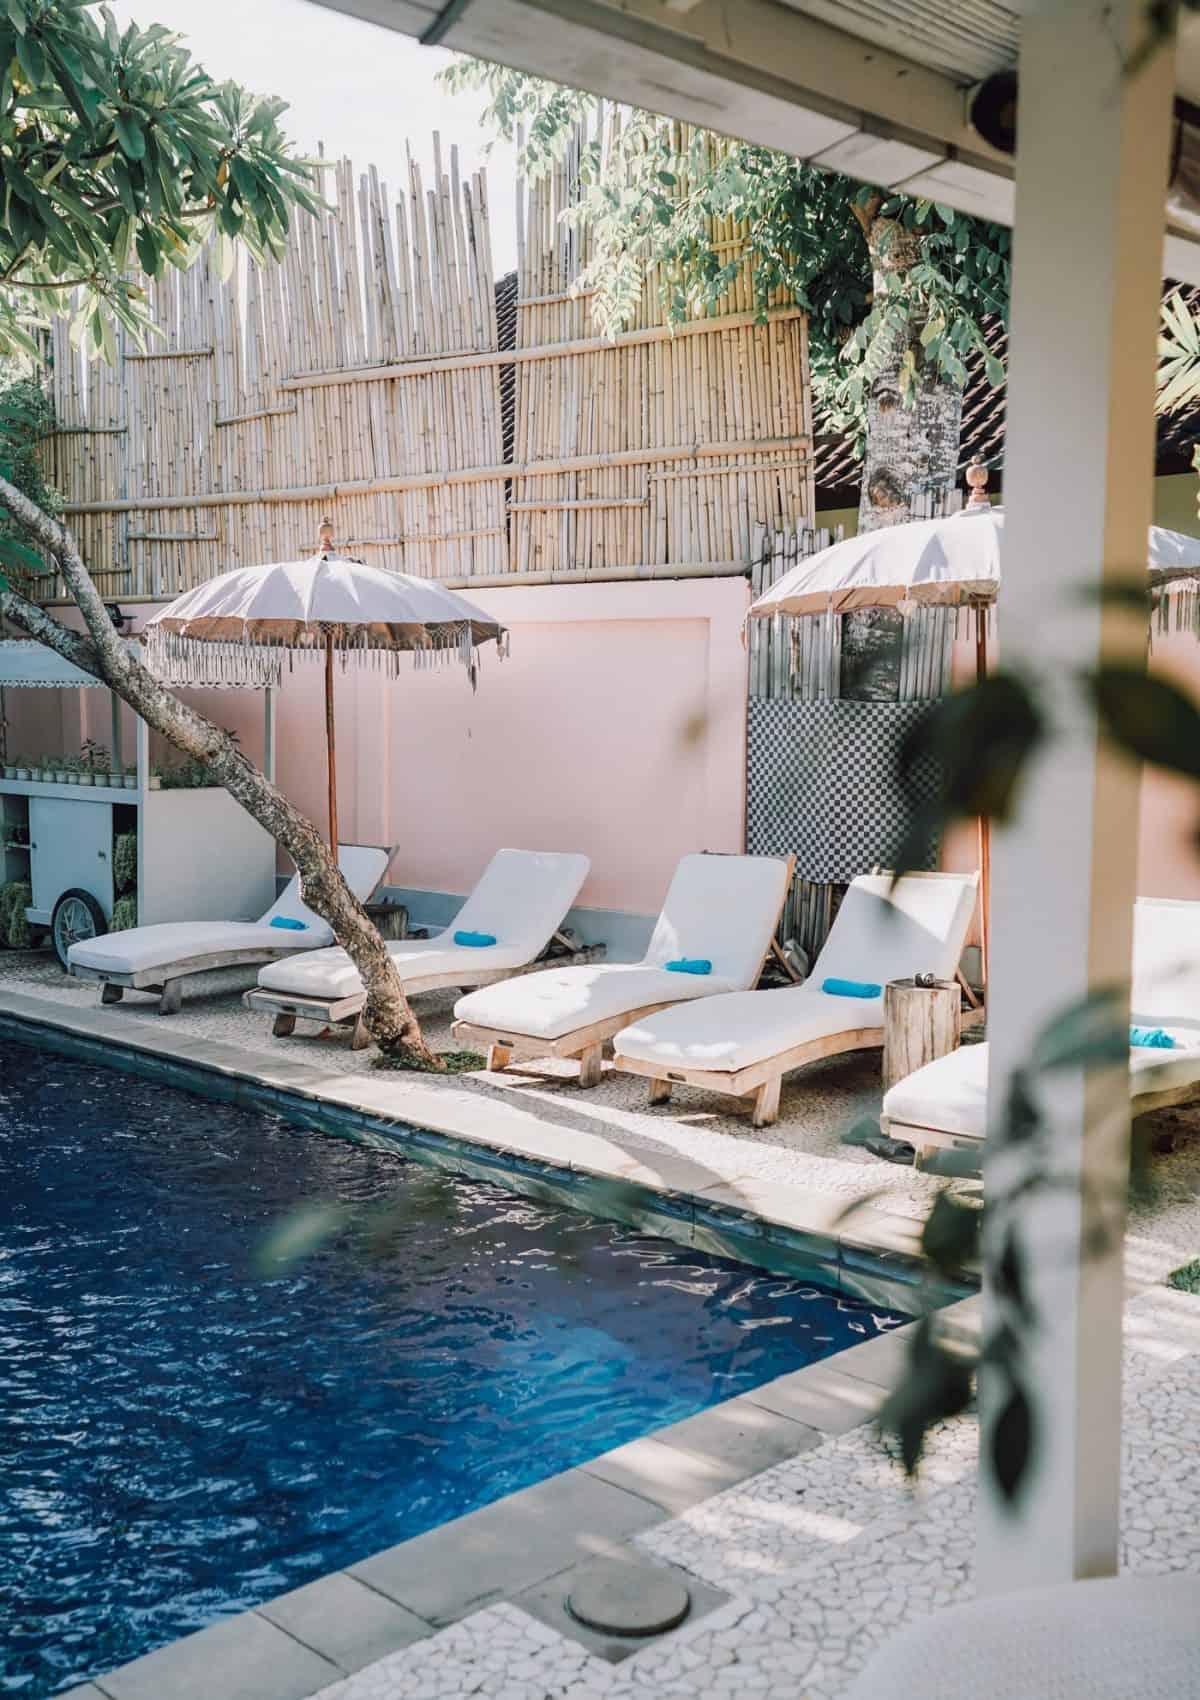 The Chillhouse Yoga Retreat Bali